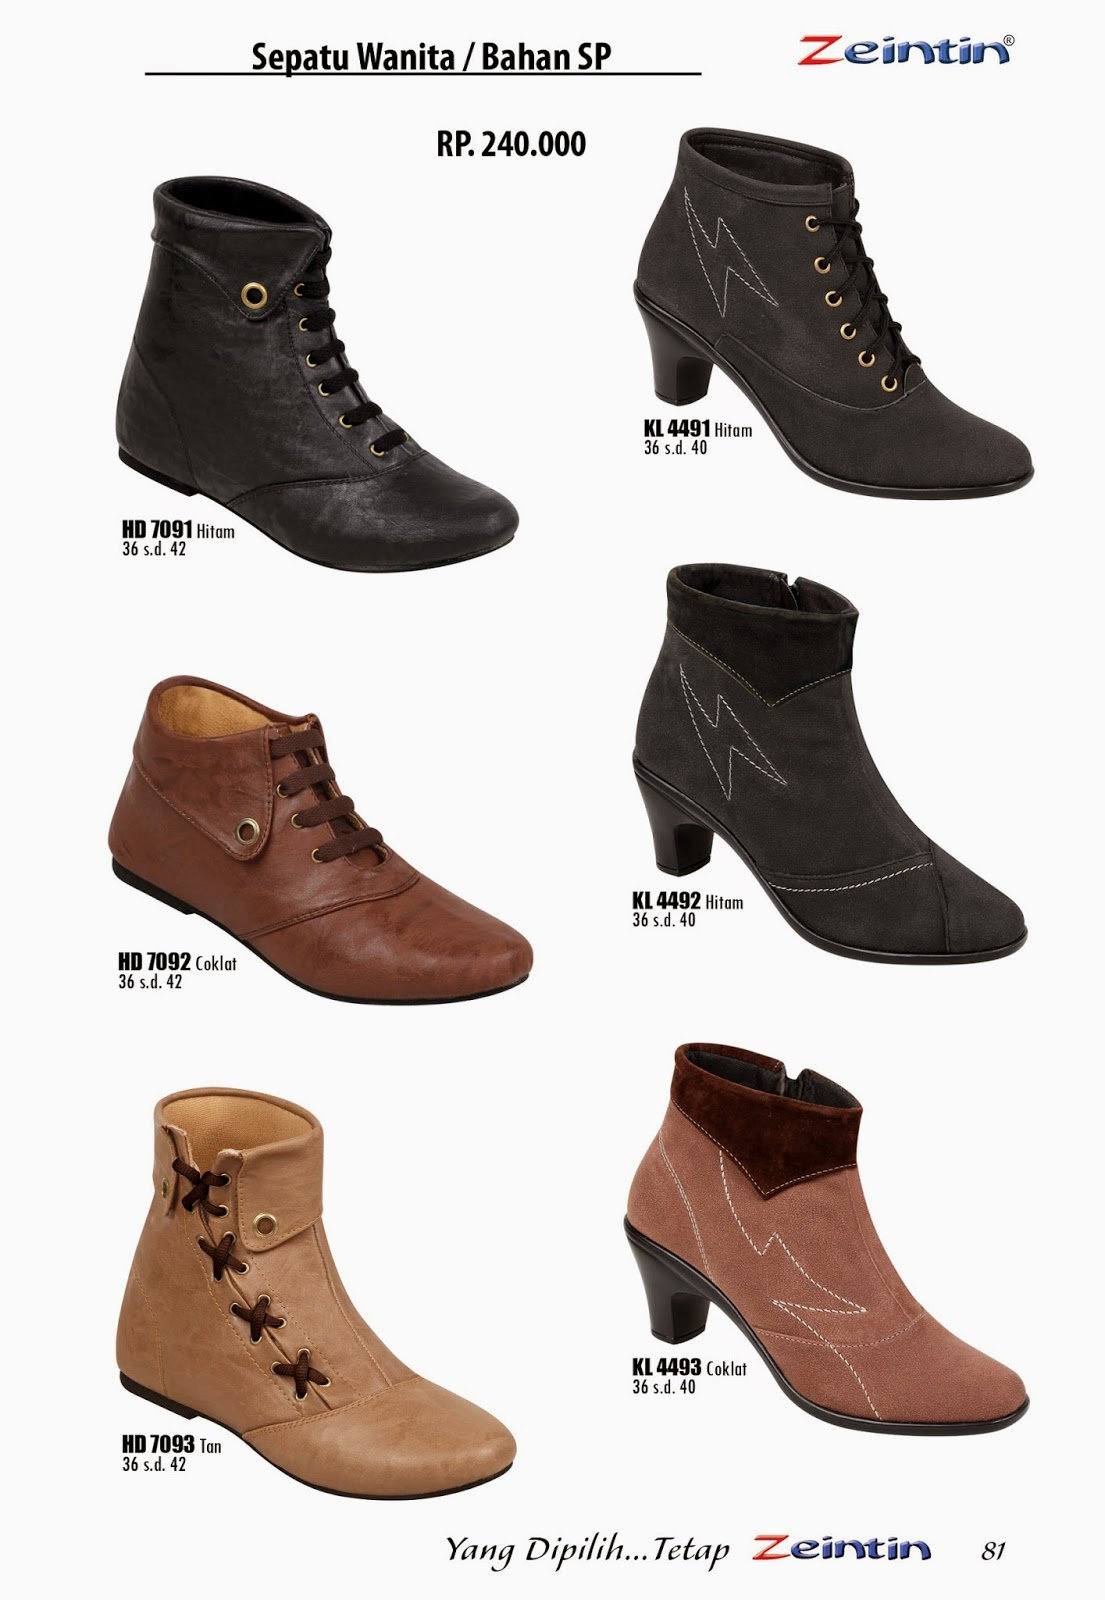 Jual sepatu kets wanita zeintin Bahan SP M B P OLSHOP17 Tokopedia Source · List  Harga Sepatu Formal Wanita Kulit Zeintin Za 9866 terbaru d6438a4731